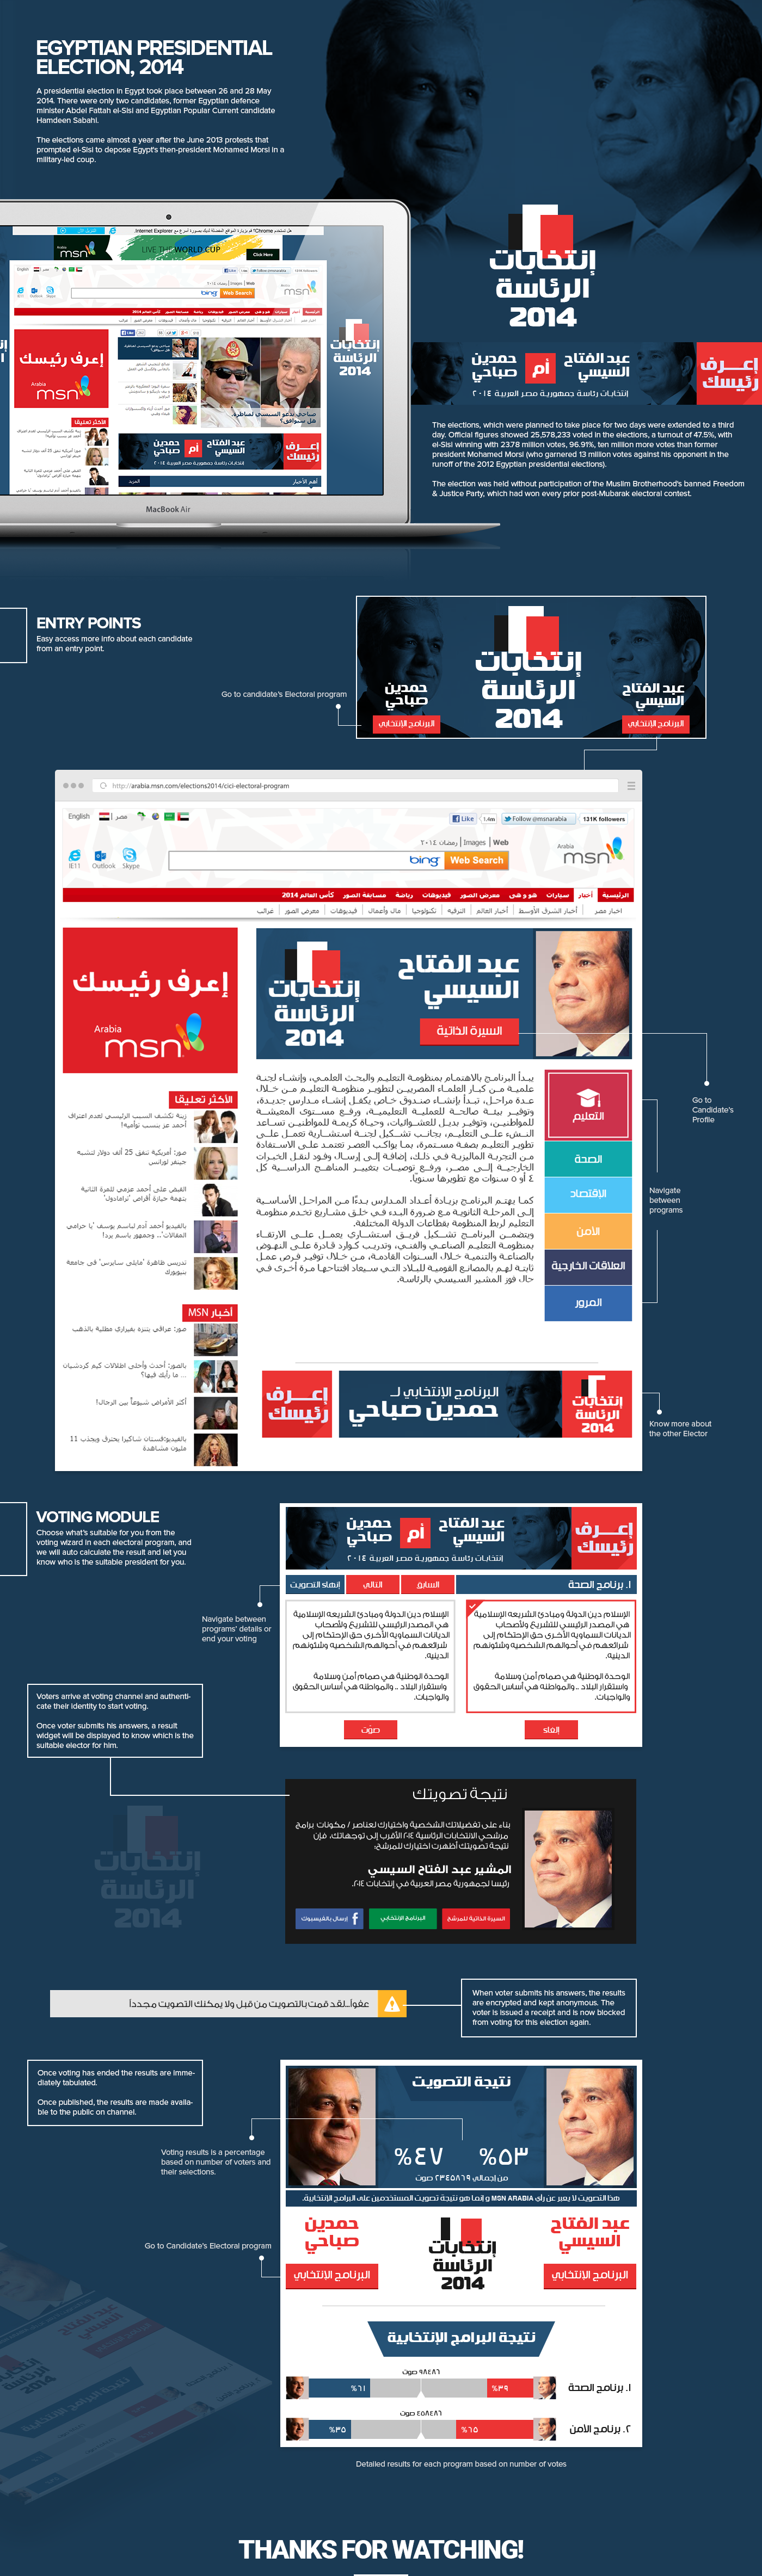 GUI ux UI Website Election egypt Presidential انتخابات مصر عبد الفتاح السيسي Sisi voting msn arabic